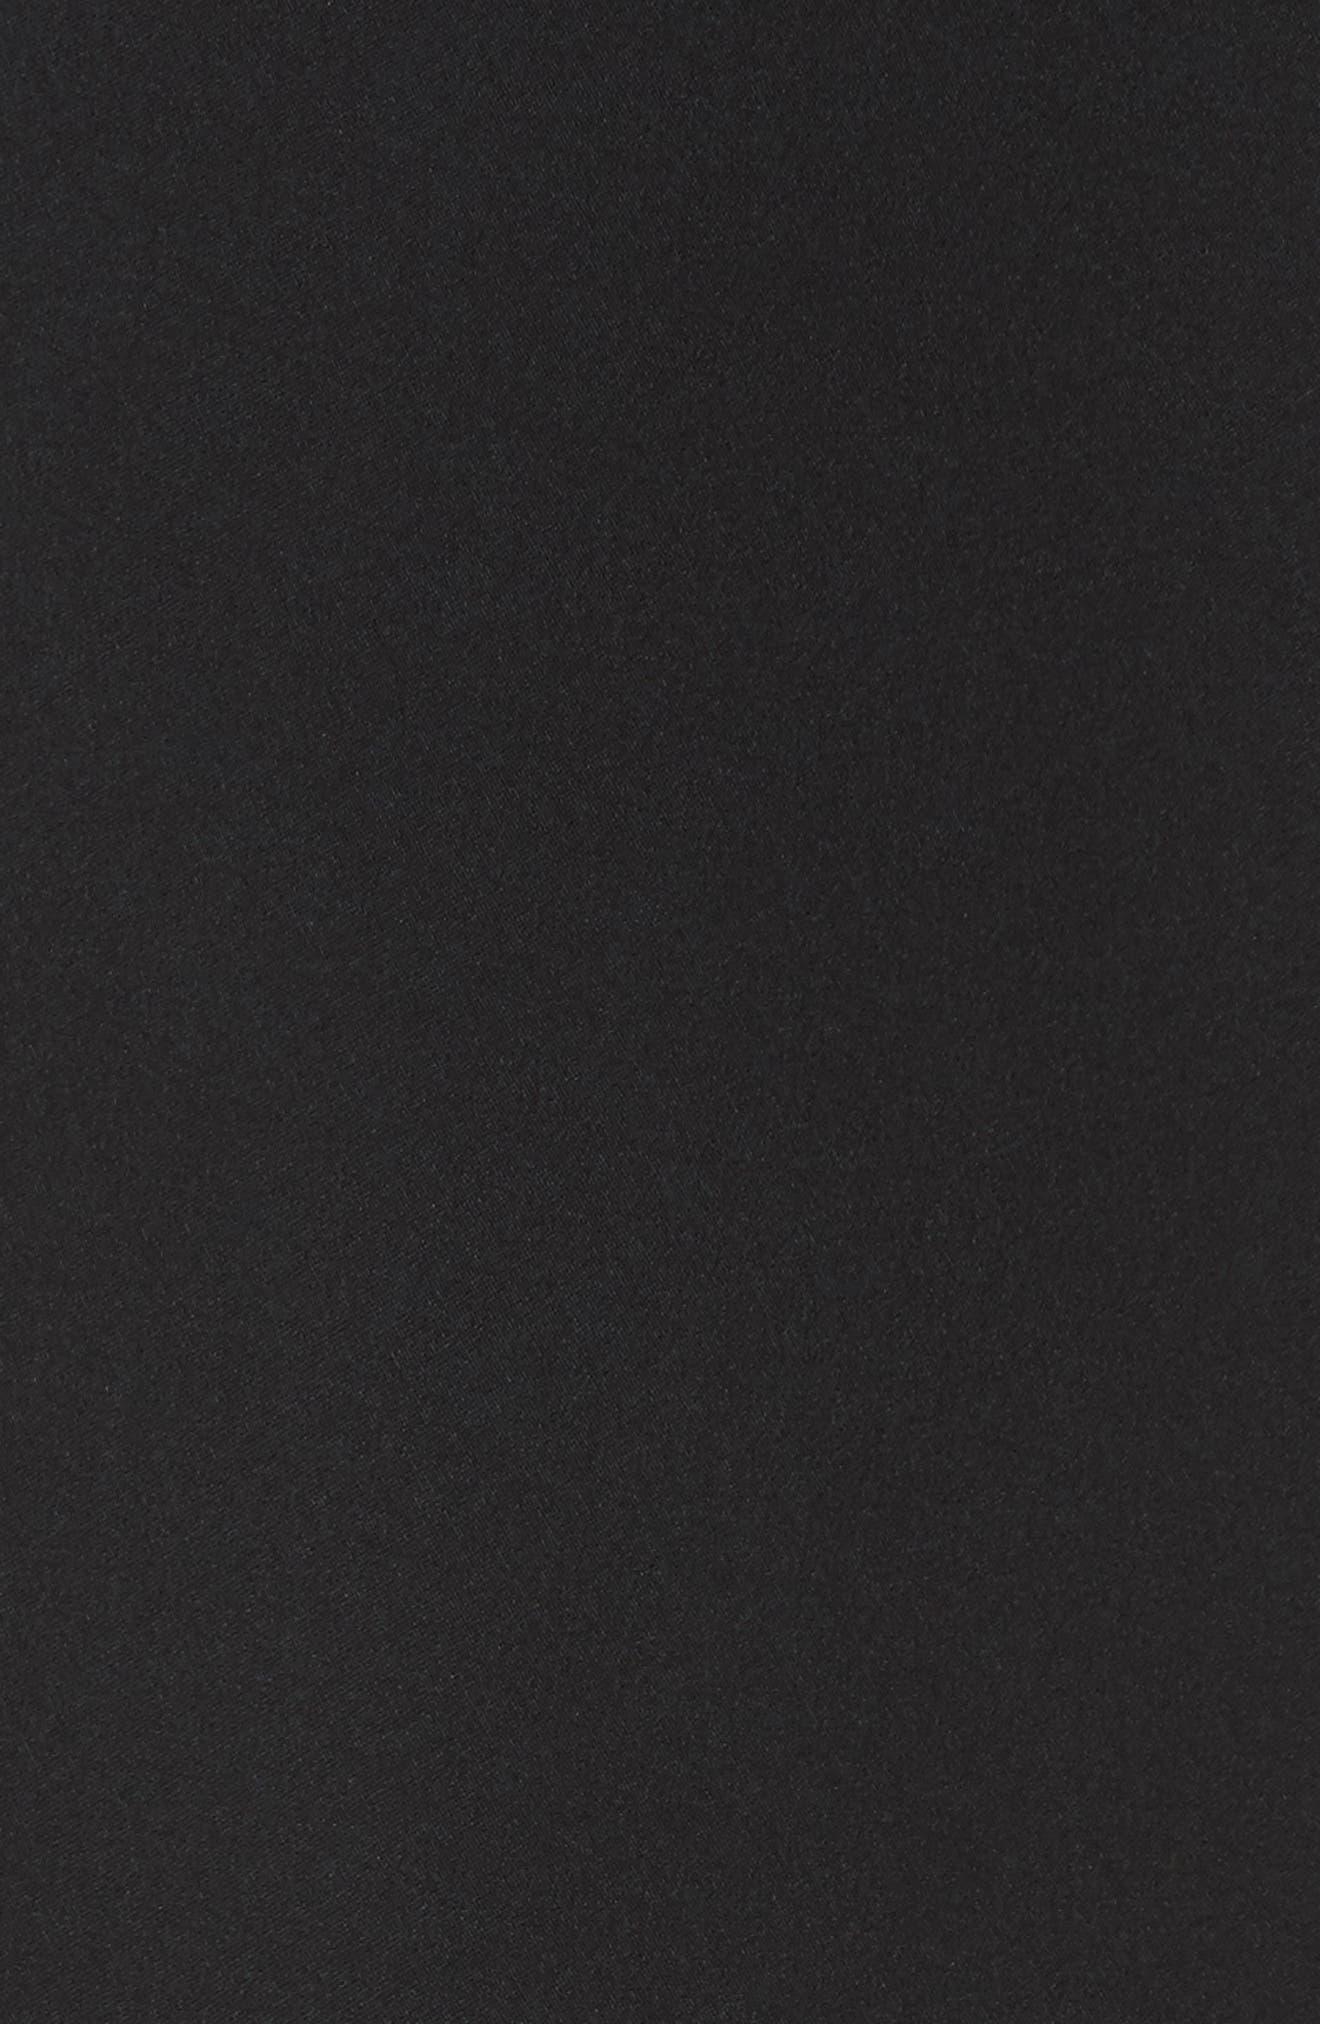 Tanelis Georgette Top,                             Alternate thumbnail 5, color,                             BLACK